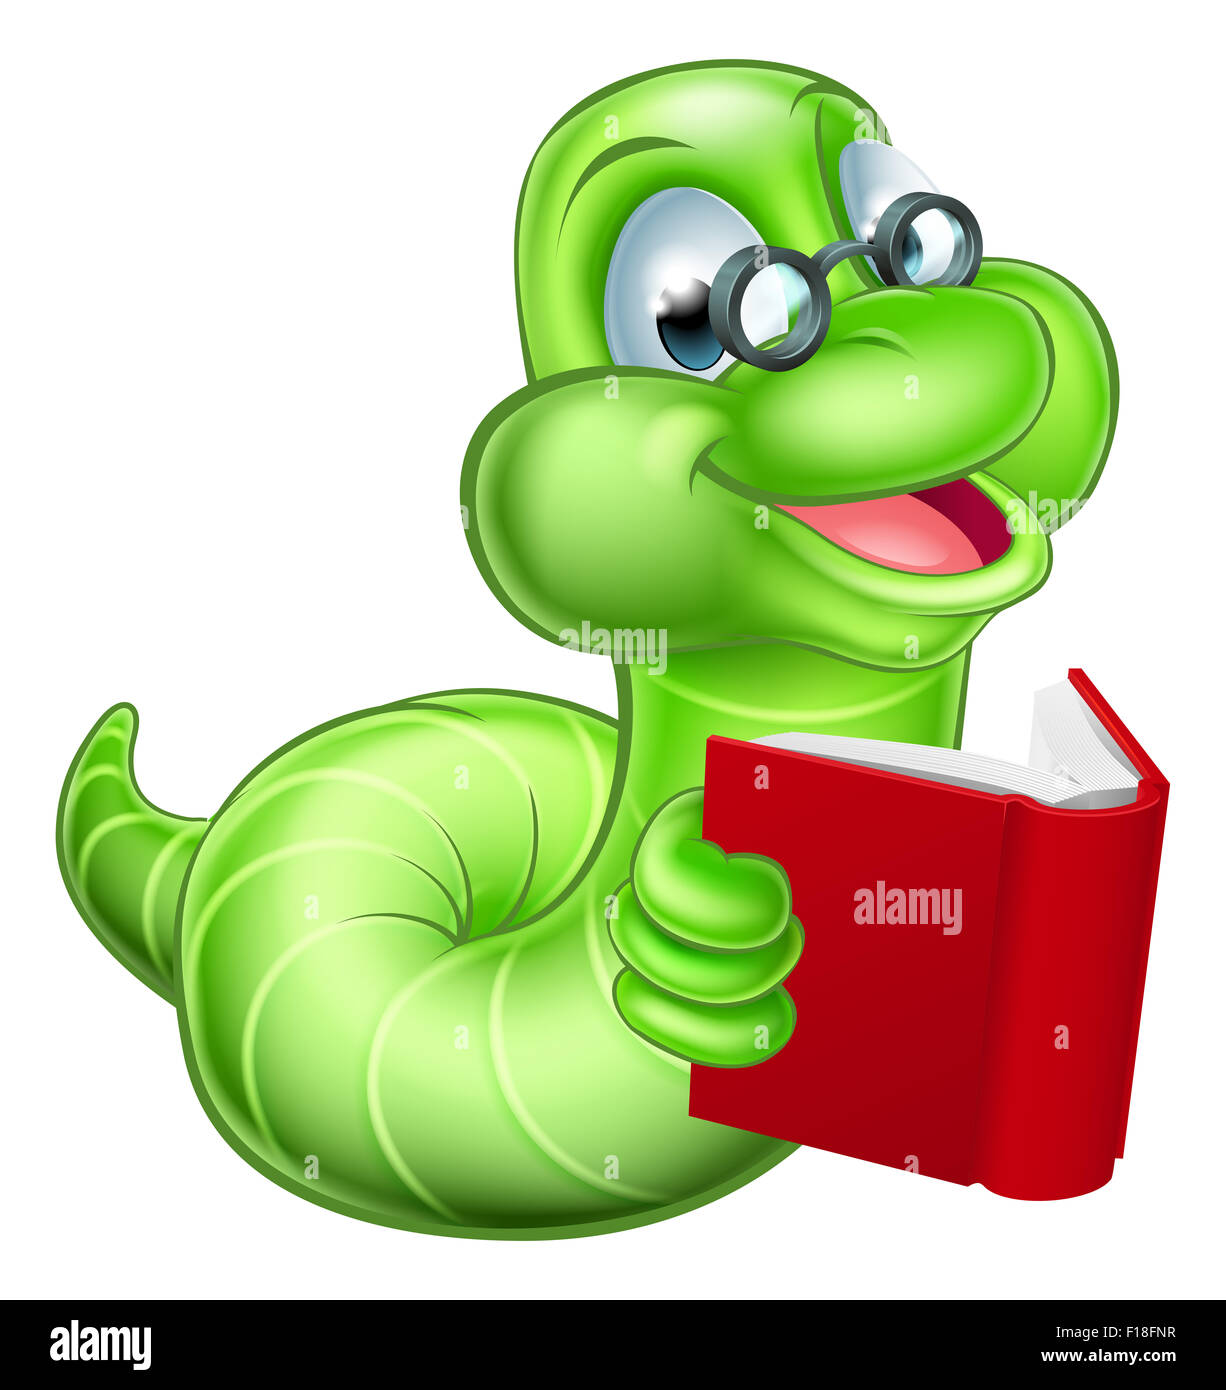 Cute smiling green cartoon caterpillar worm bookworm with glasses ... for Clipart Cute Caterpillar  545xkb